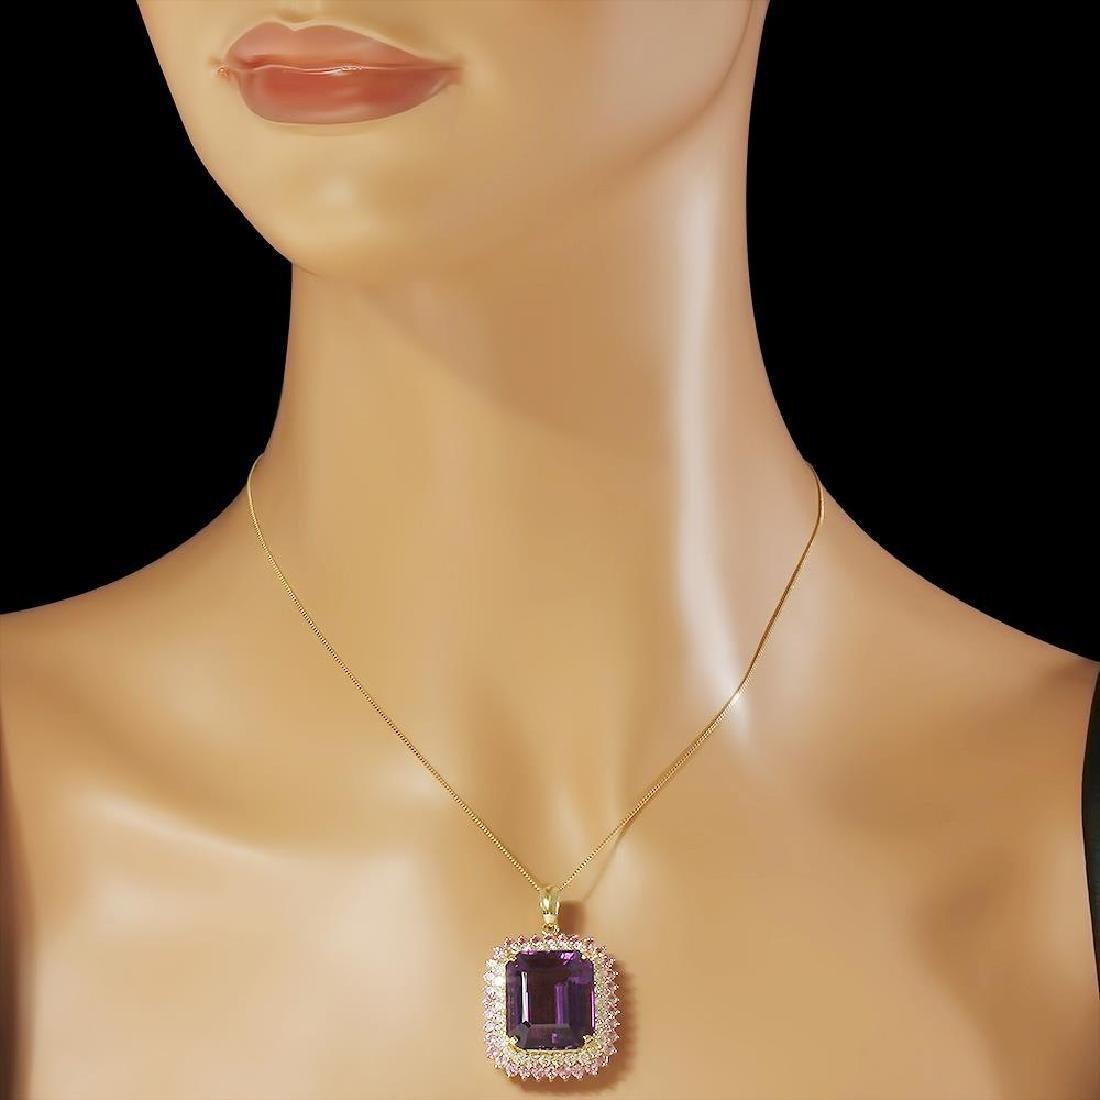 14K Gold 25.44ct Amethyst 2.03ct Sapphire 1.51ct - 3